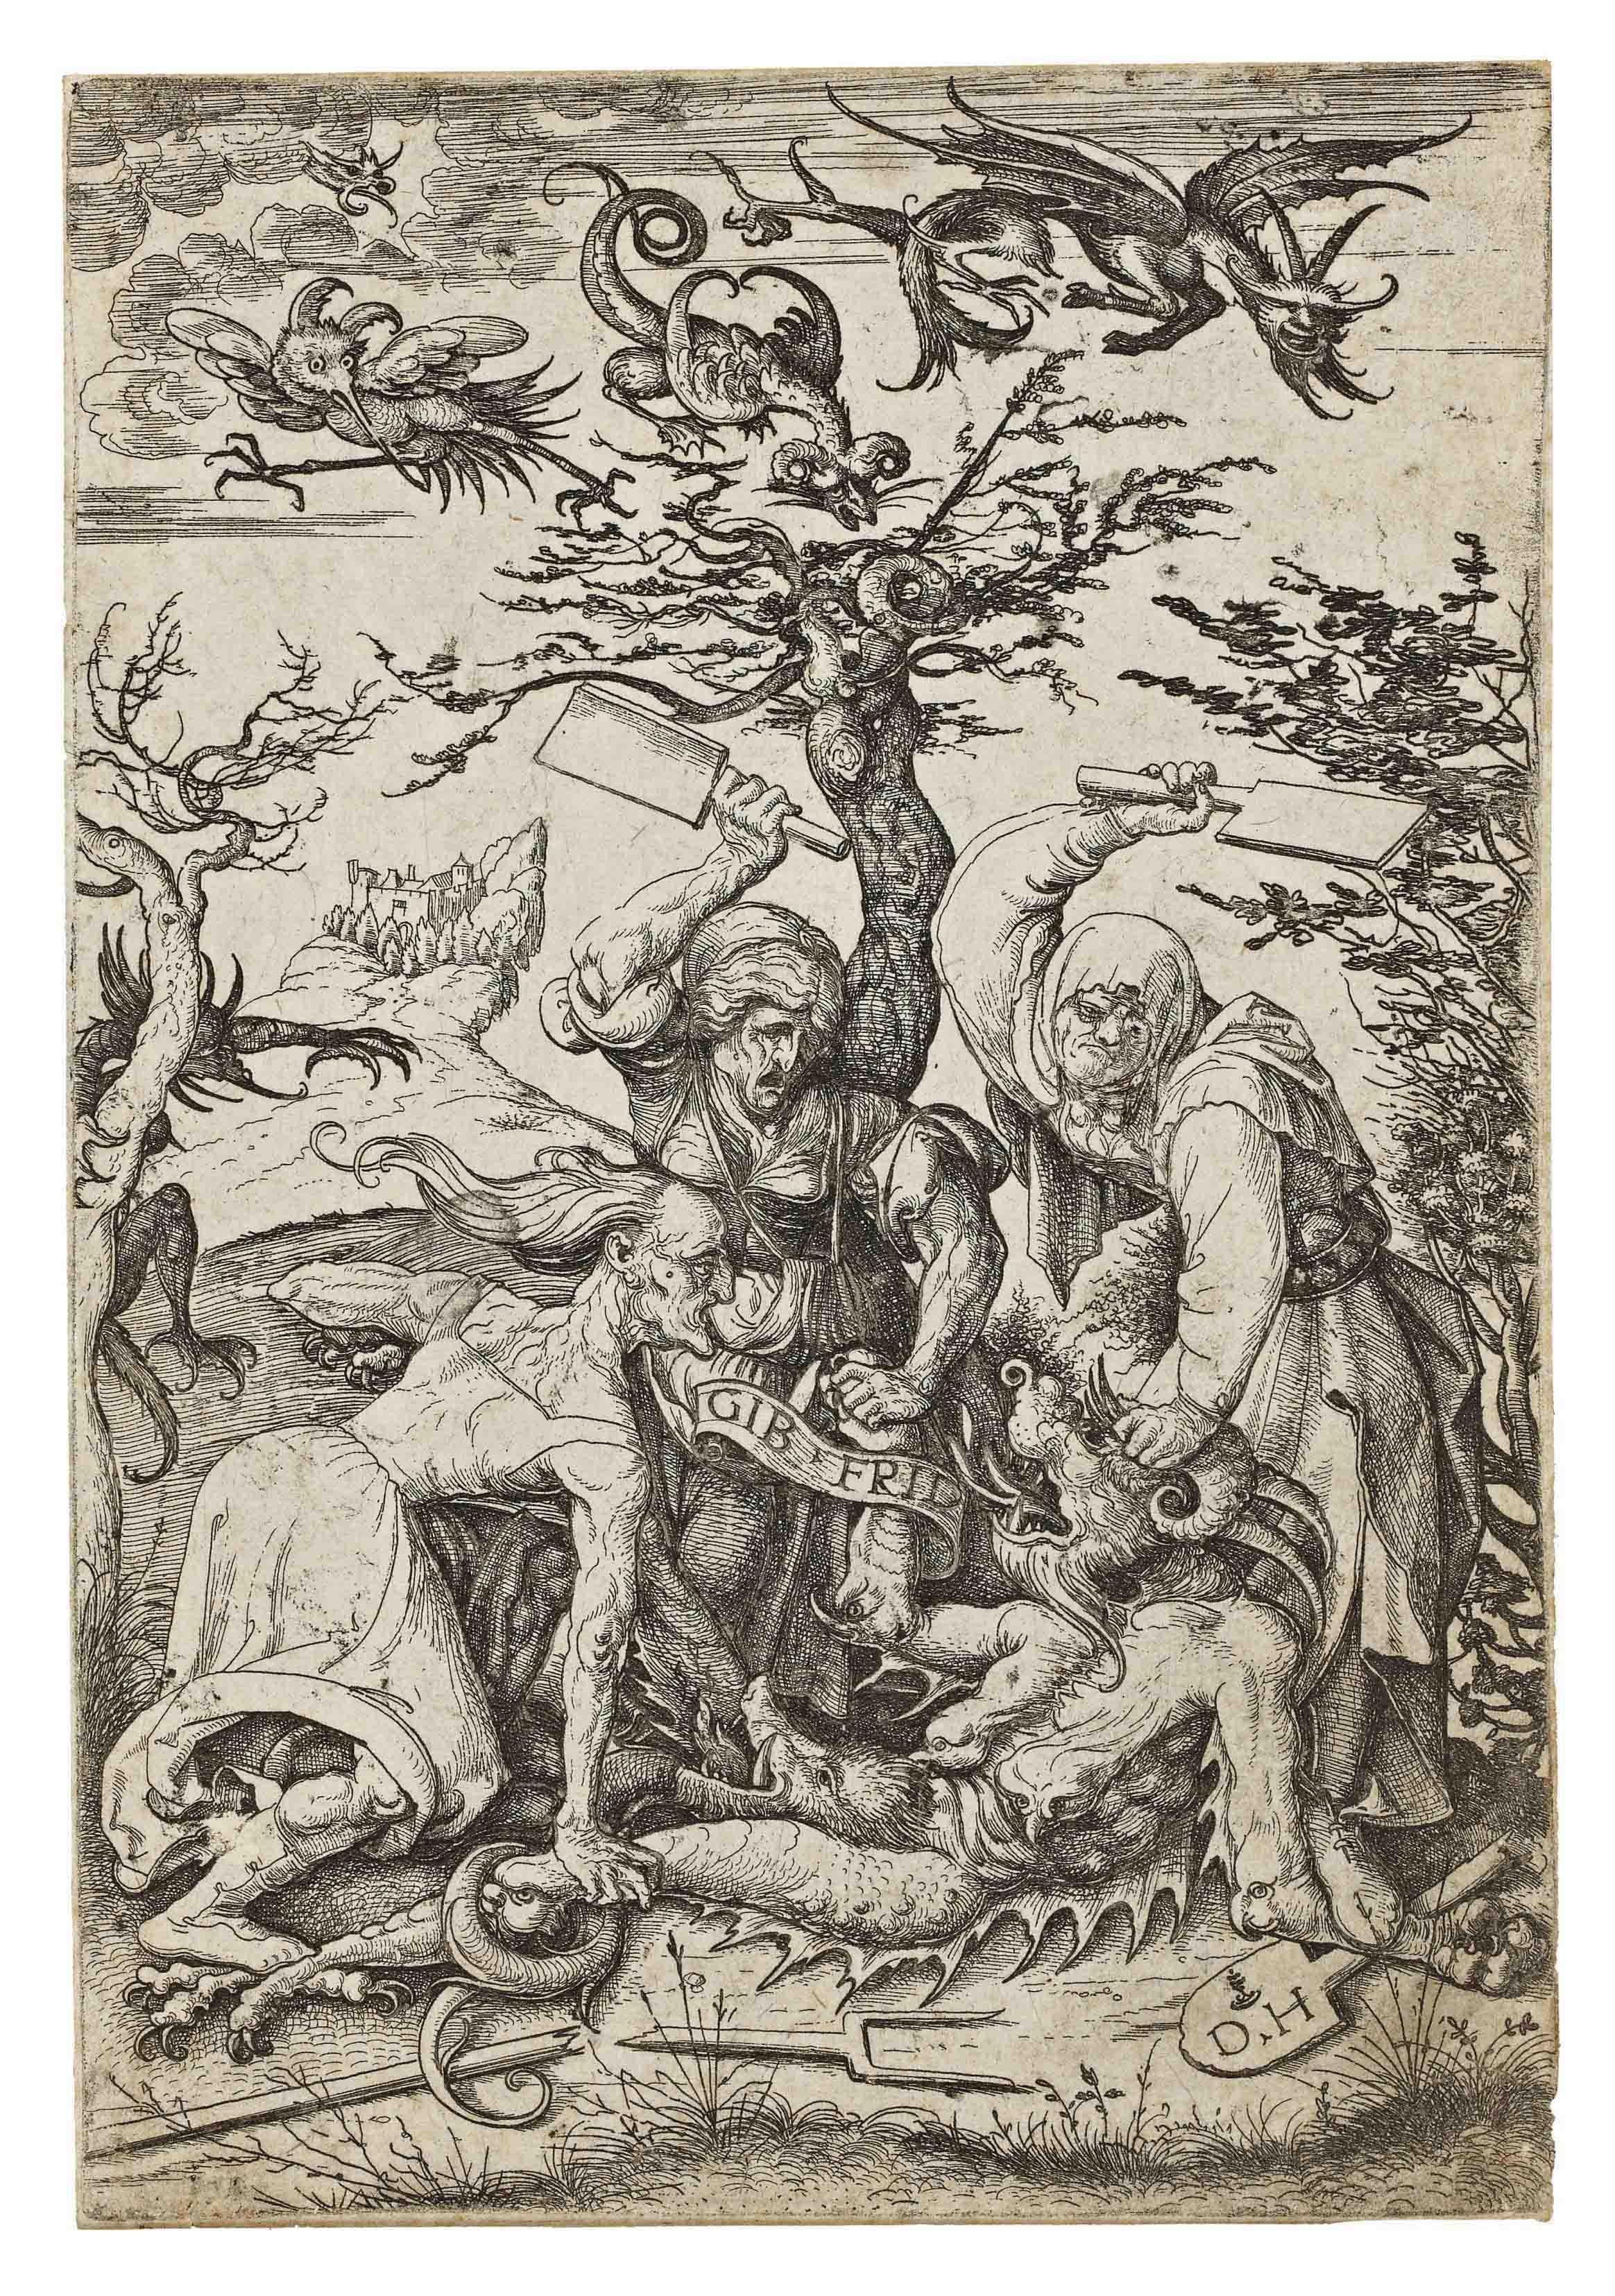 Three Old Women beating the Devil (B. 71; Holl. 80)